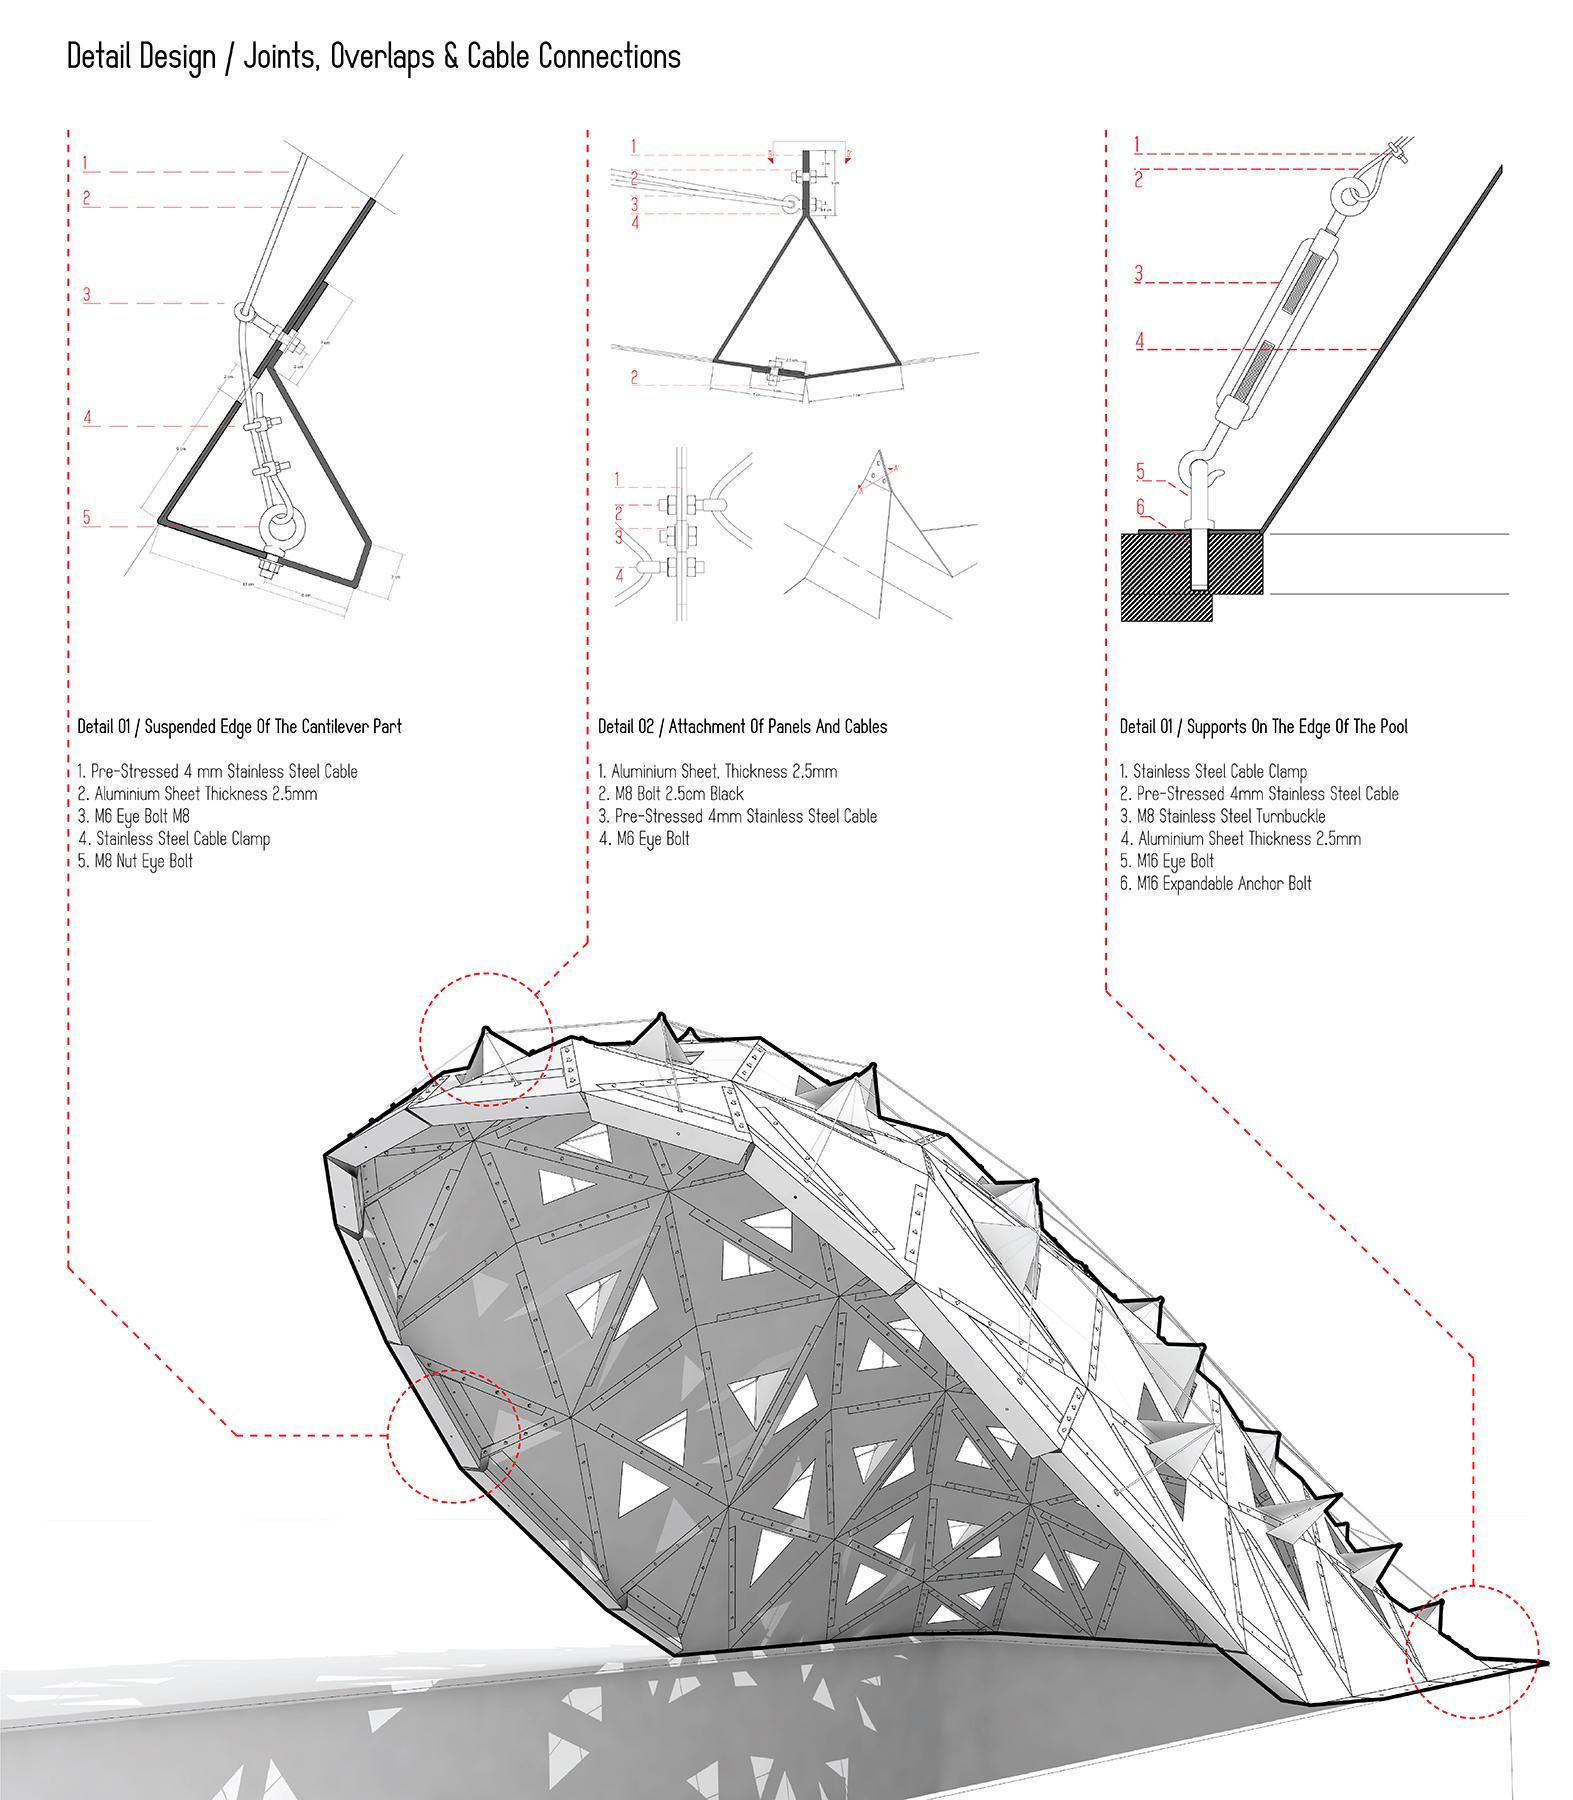 Comstruct Tehran Karamba3d Cantilever Diagram Beam Triangular